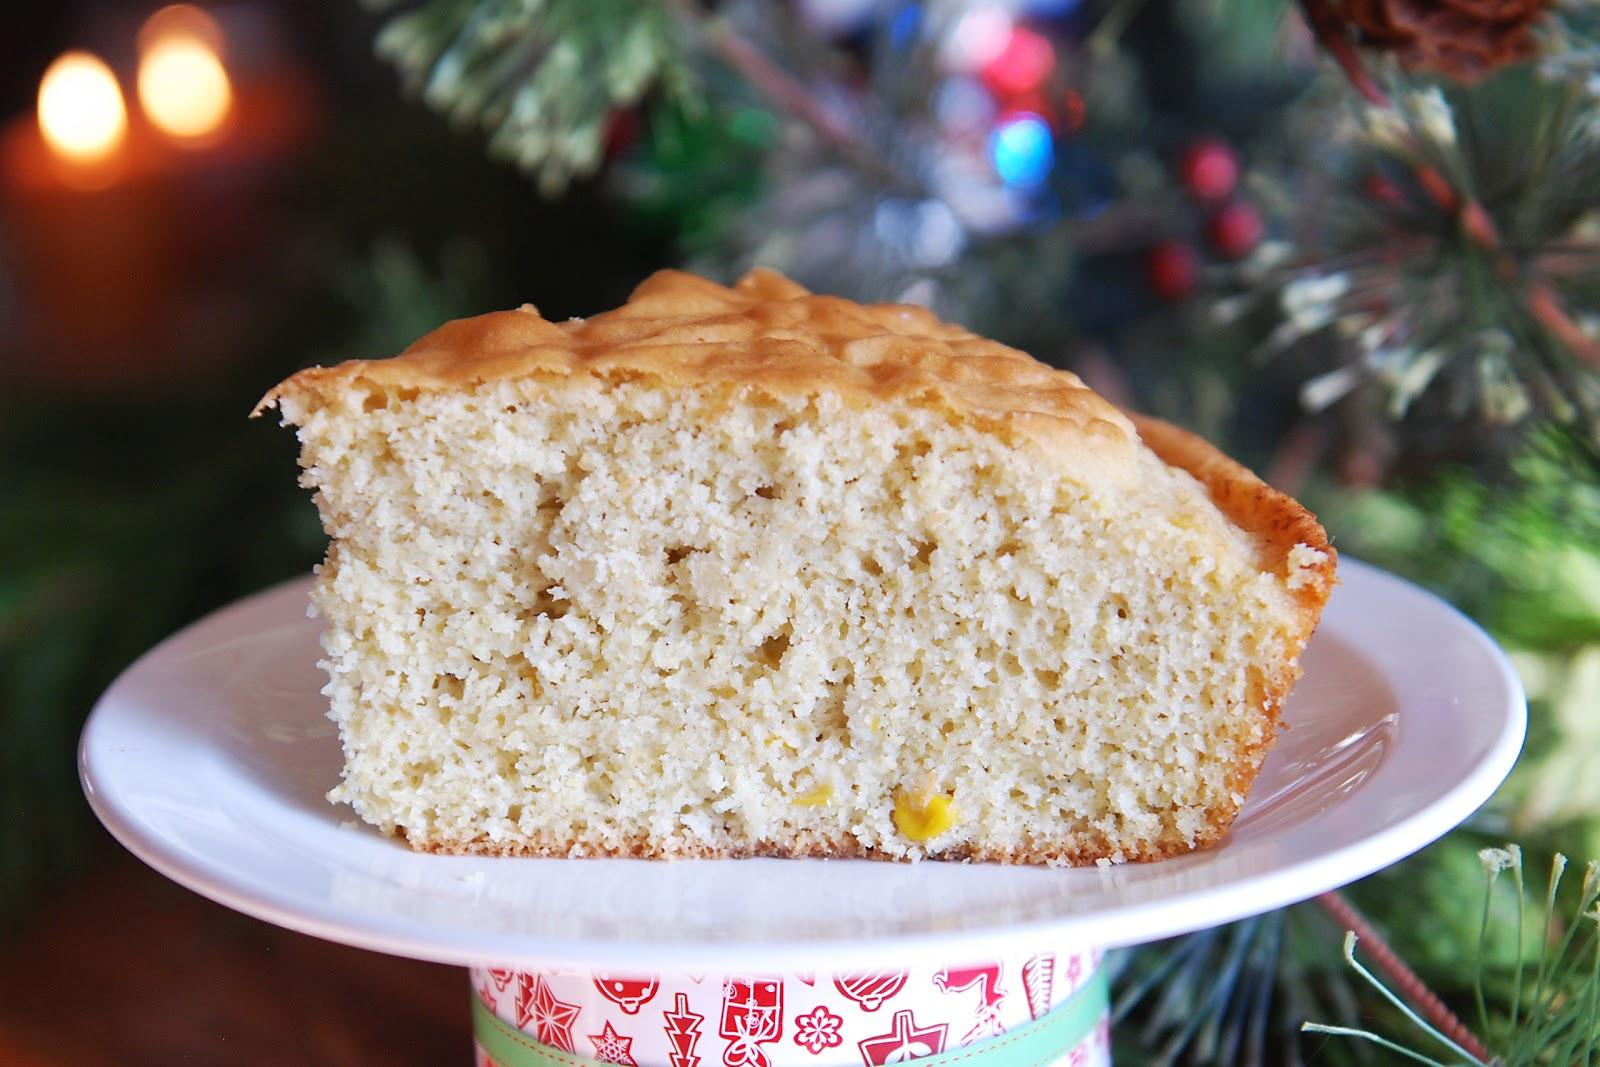 Simply Gourmet: 256. Gluten Free Cornbread